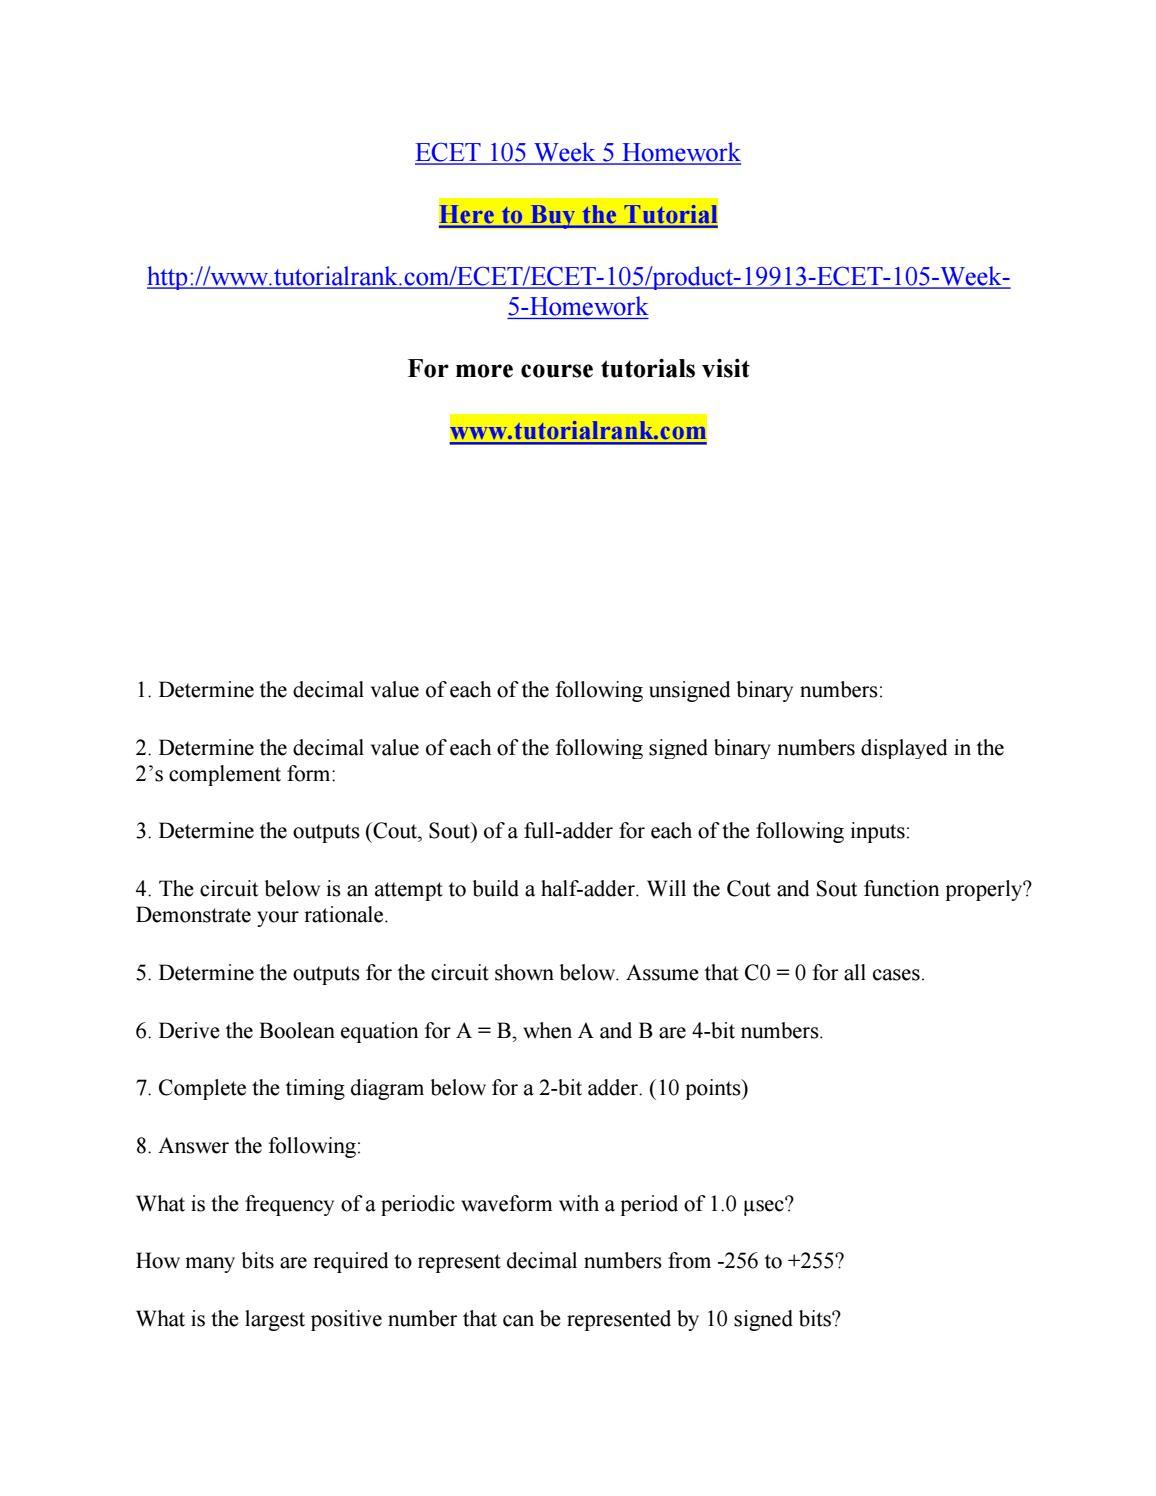 Ecet 105 Week 5 Homework By Robertsonhunt2 Issuu 1 S Complement Circuit Diagram